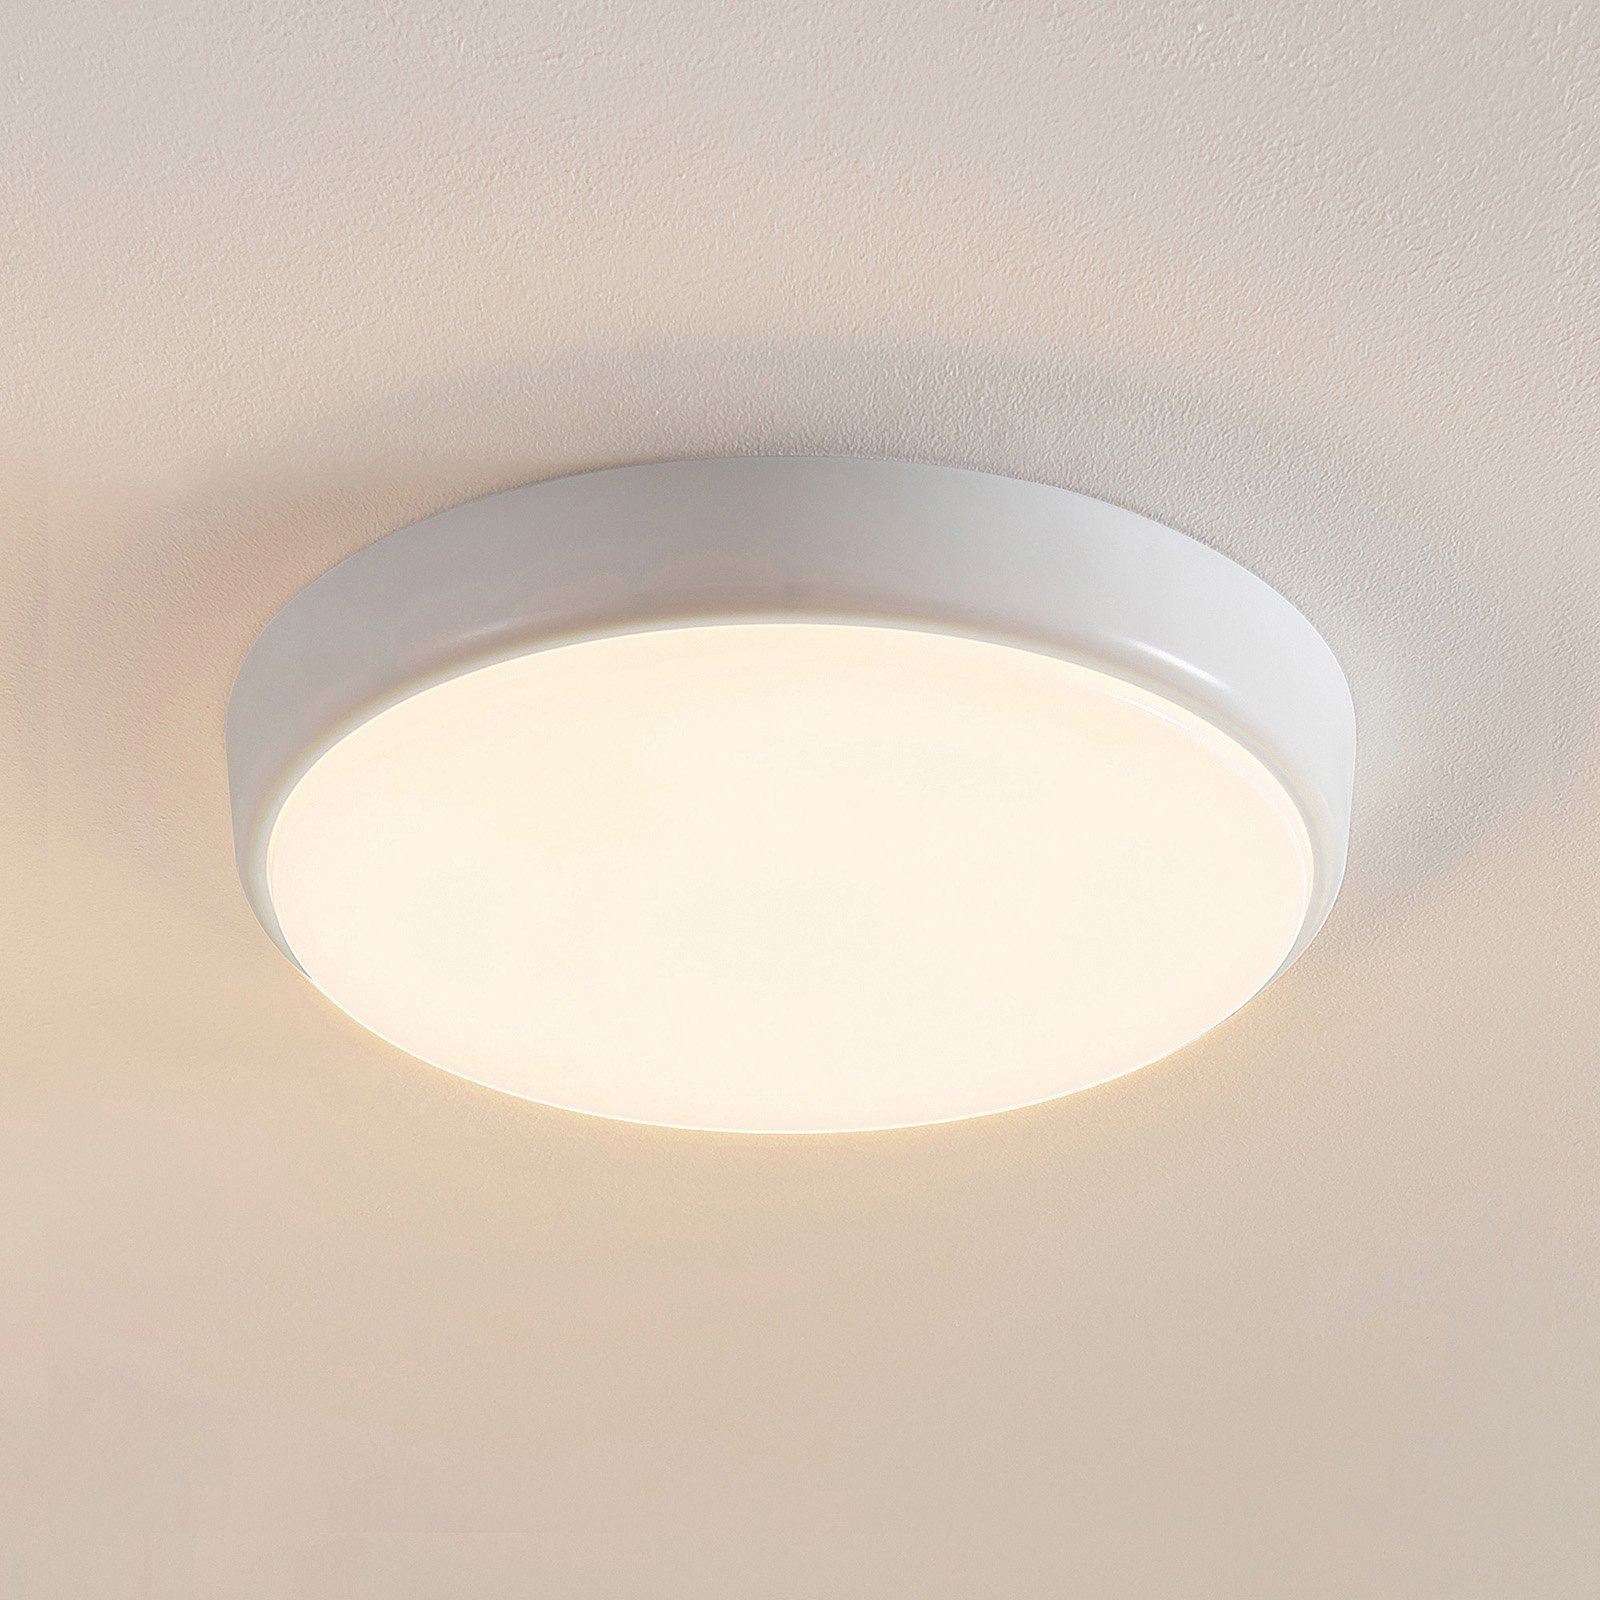 Arcchio Finn LED-taklampe, kontrollerbar, Ø 30 cm